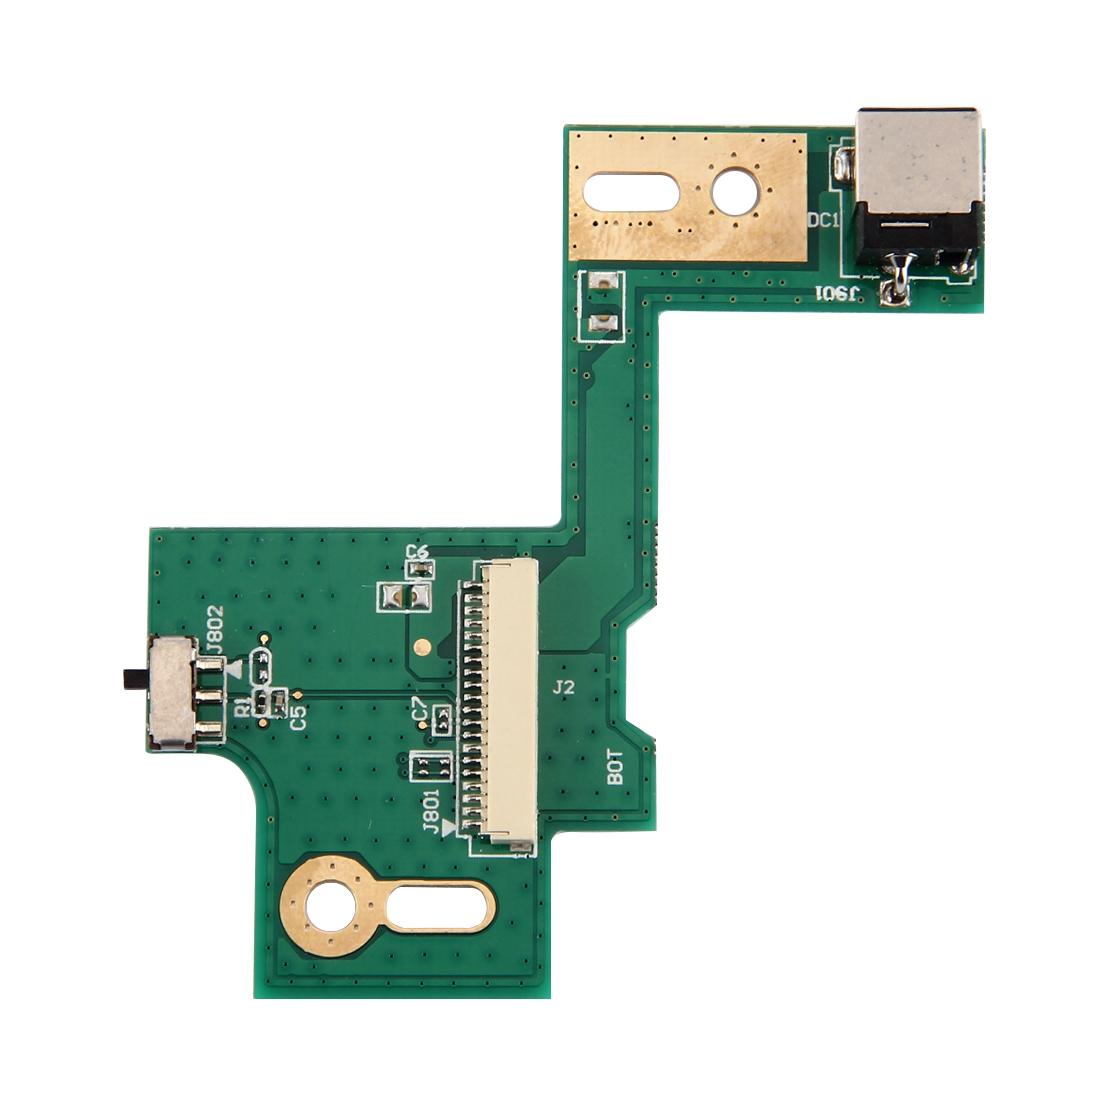 ASUS N53SN SMART LOGON WINDOWS XP DRIVER